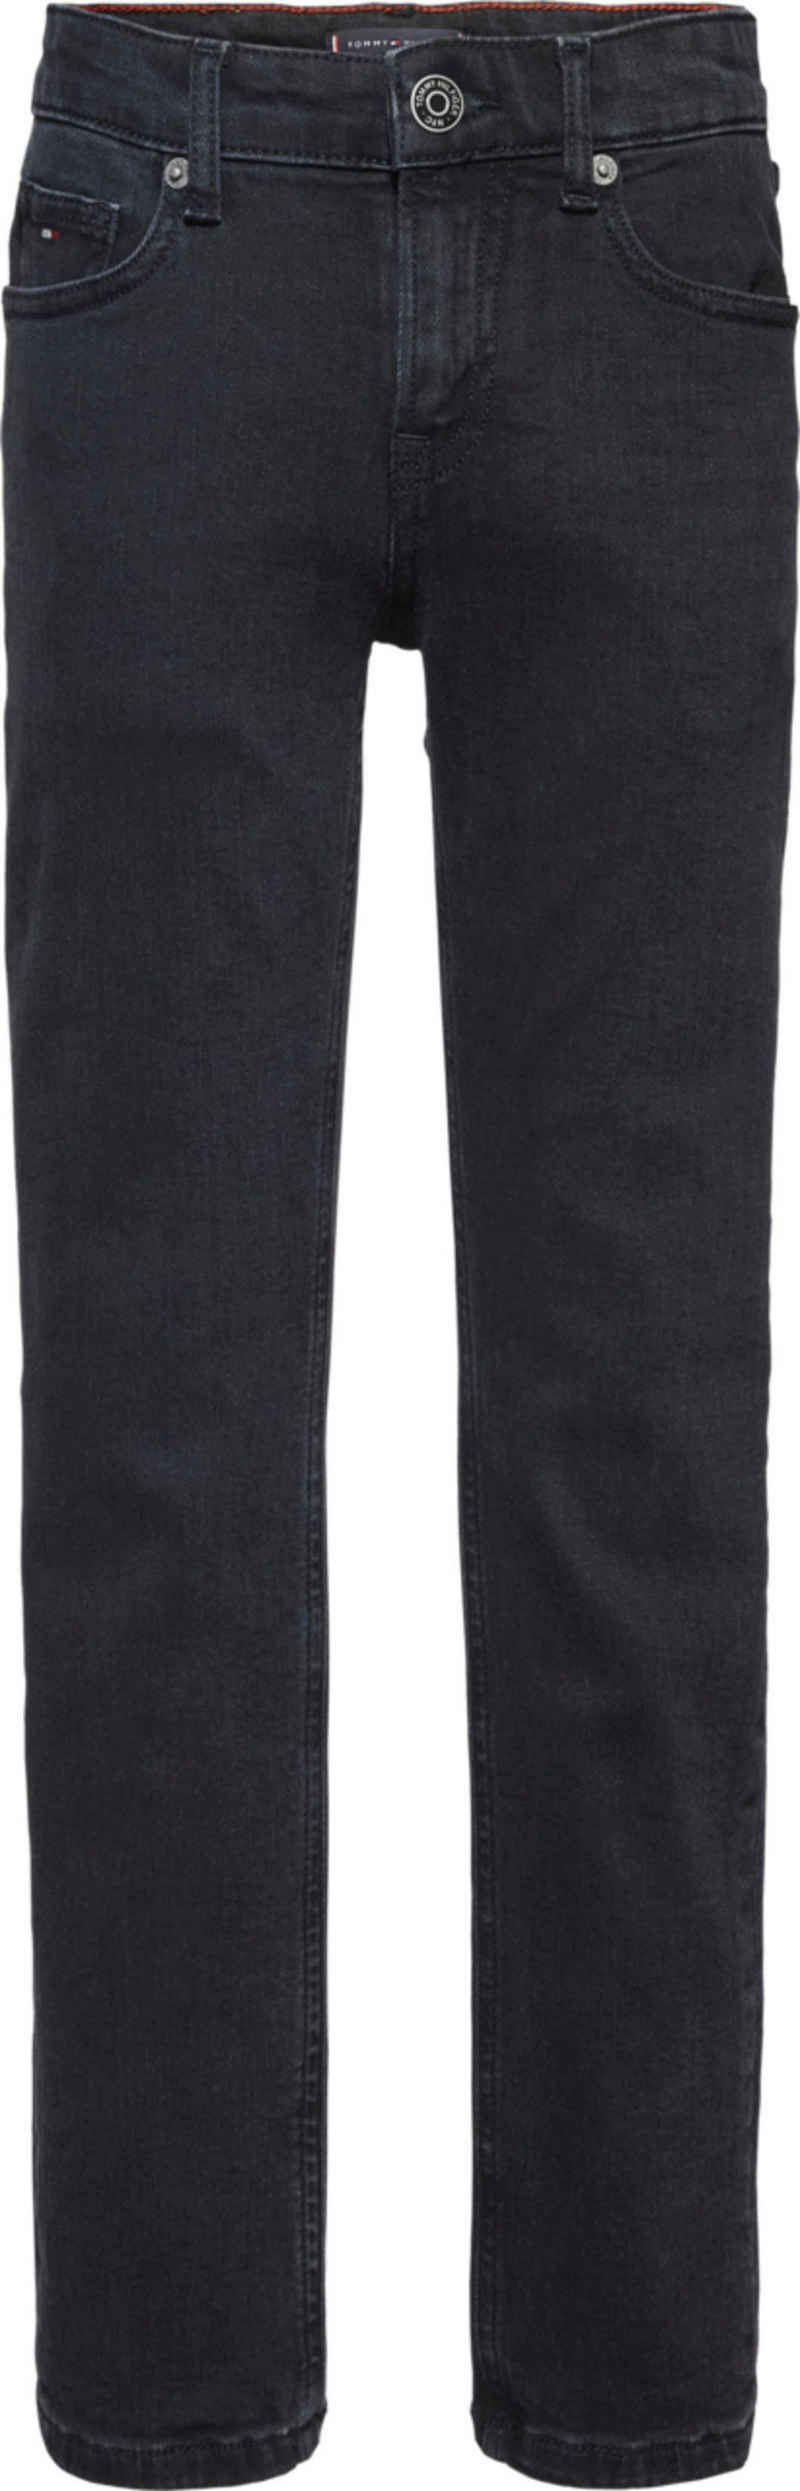 Tommy Hilfiger Stretch-Jeans »slim fit«